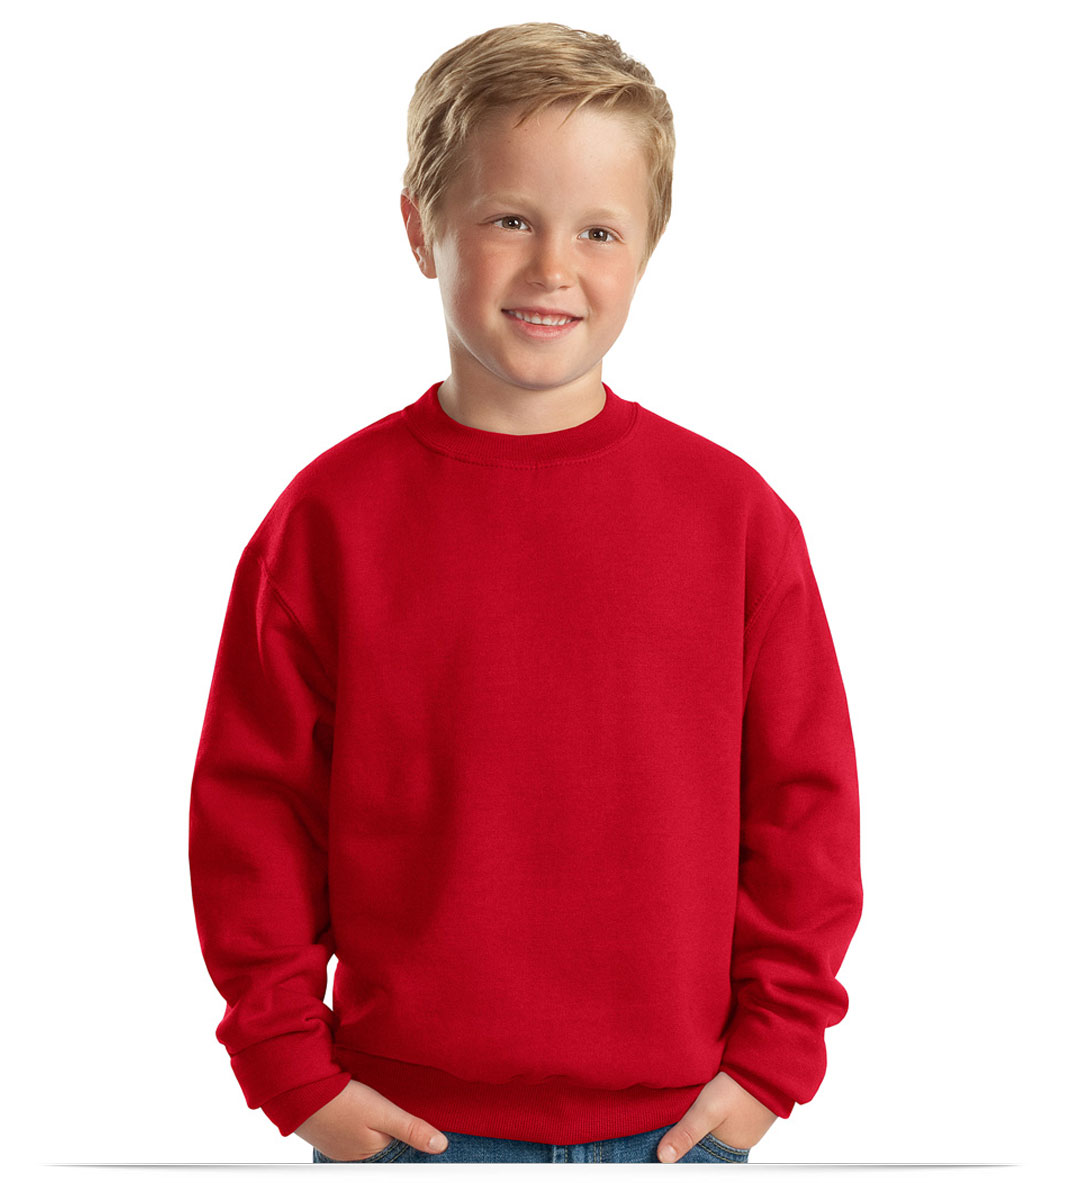 Custom Jerzees Youth Crewneck Sweatshirt